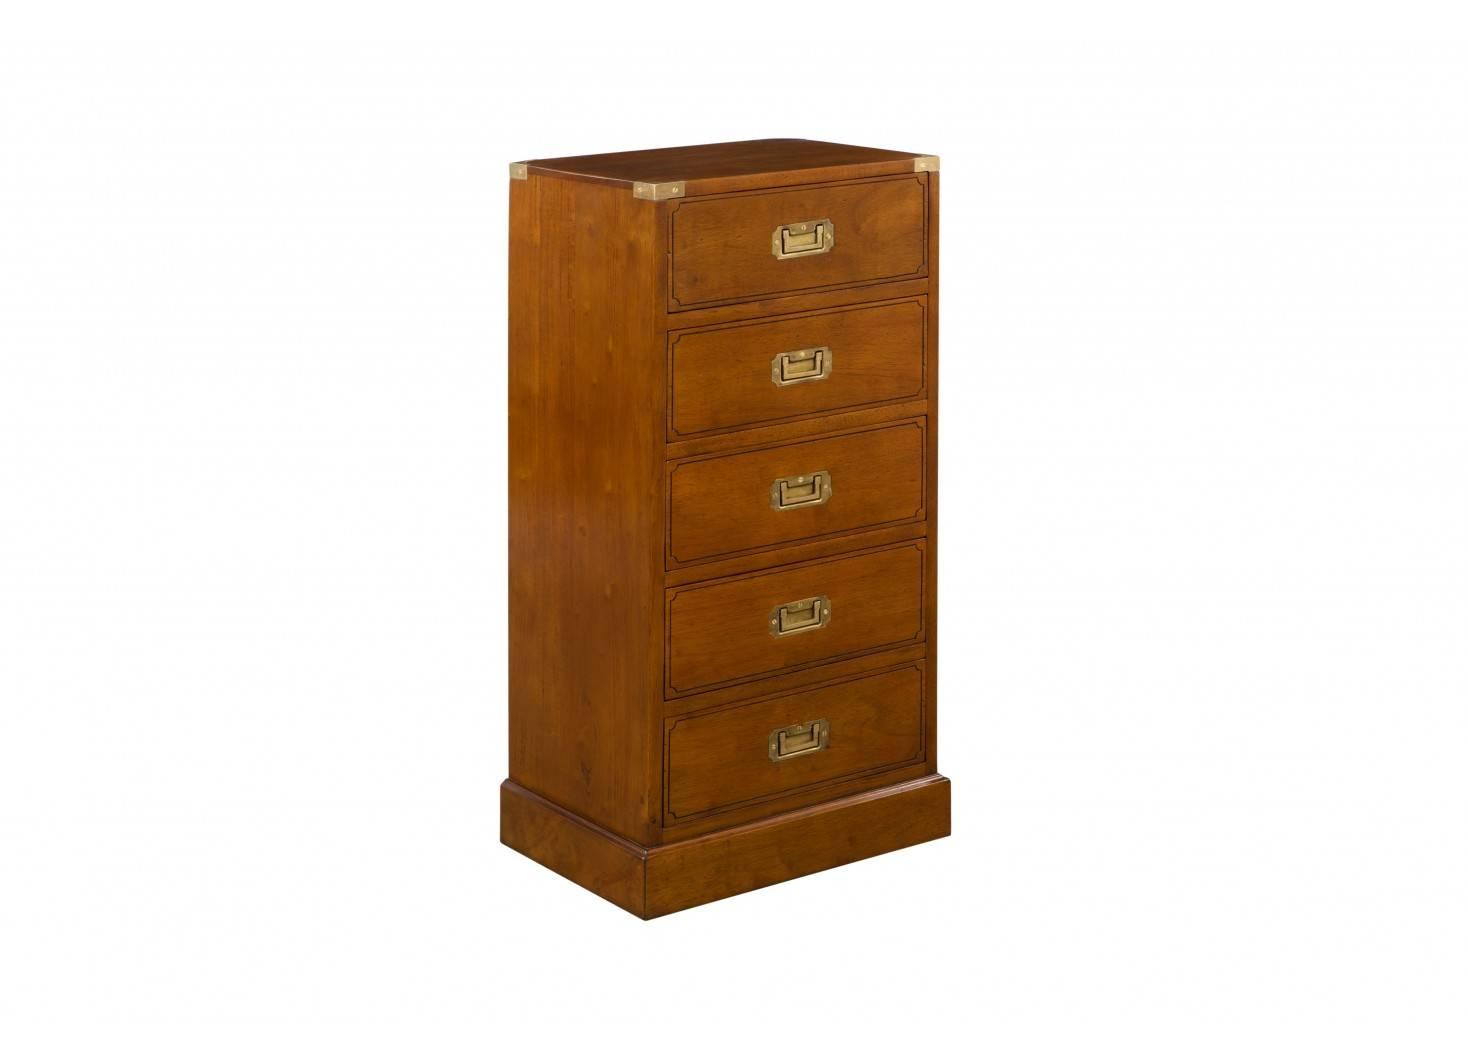 Chiffonier Marine Glasgow 5 drawers